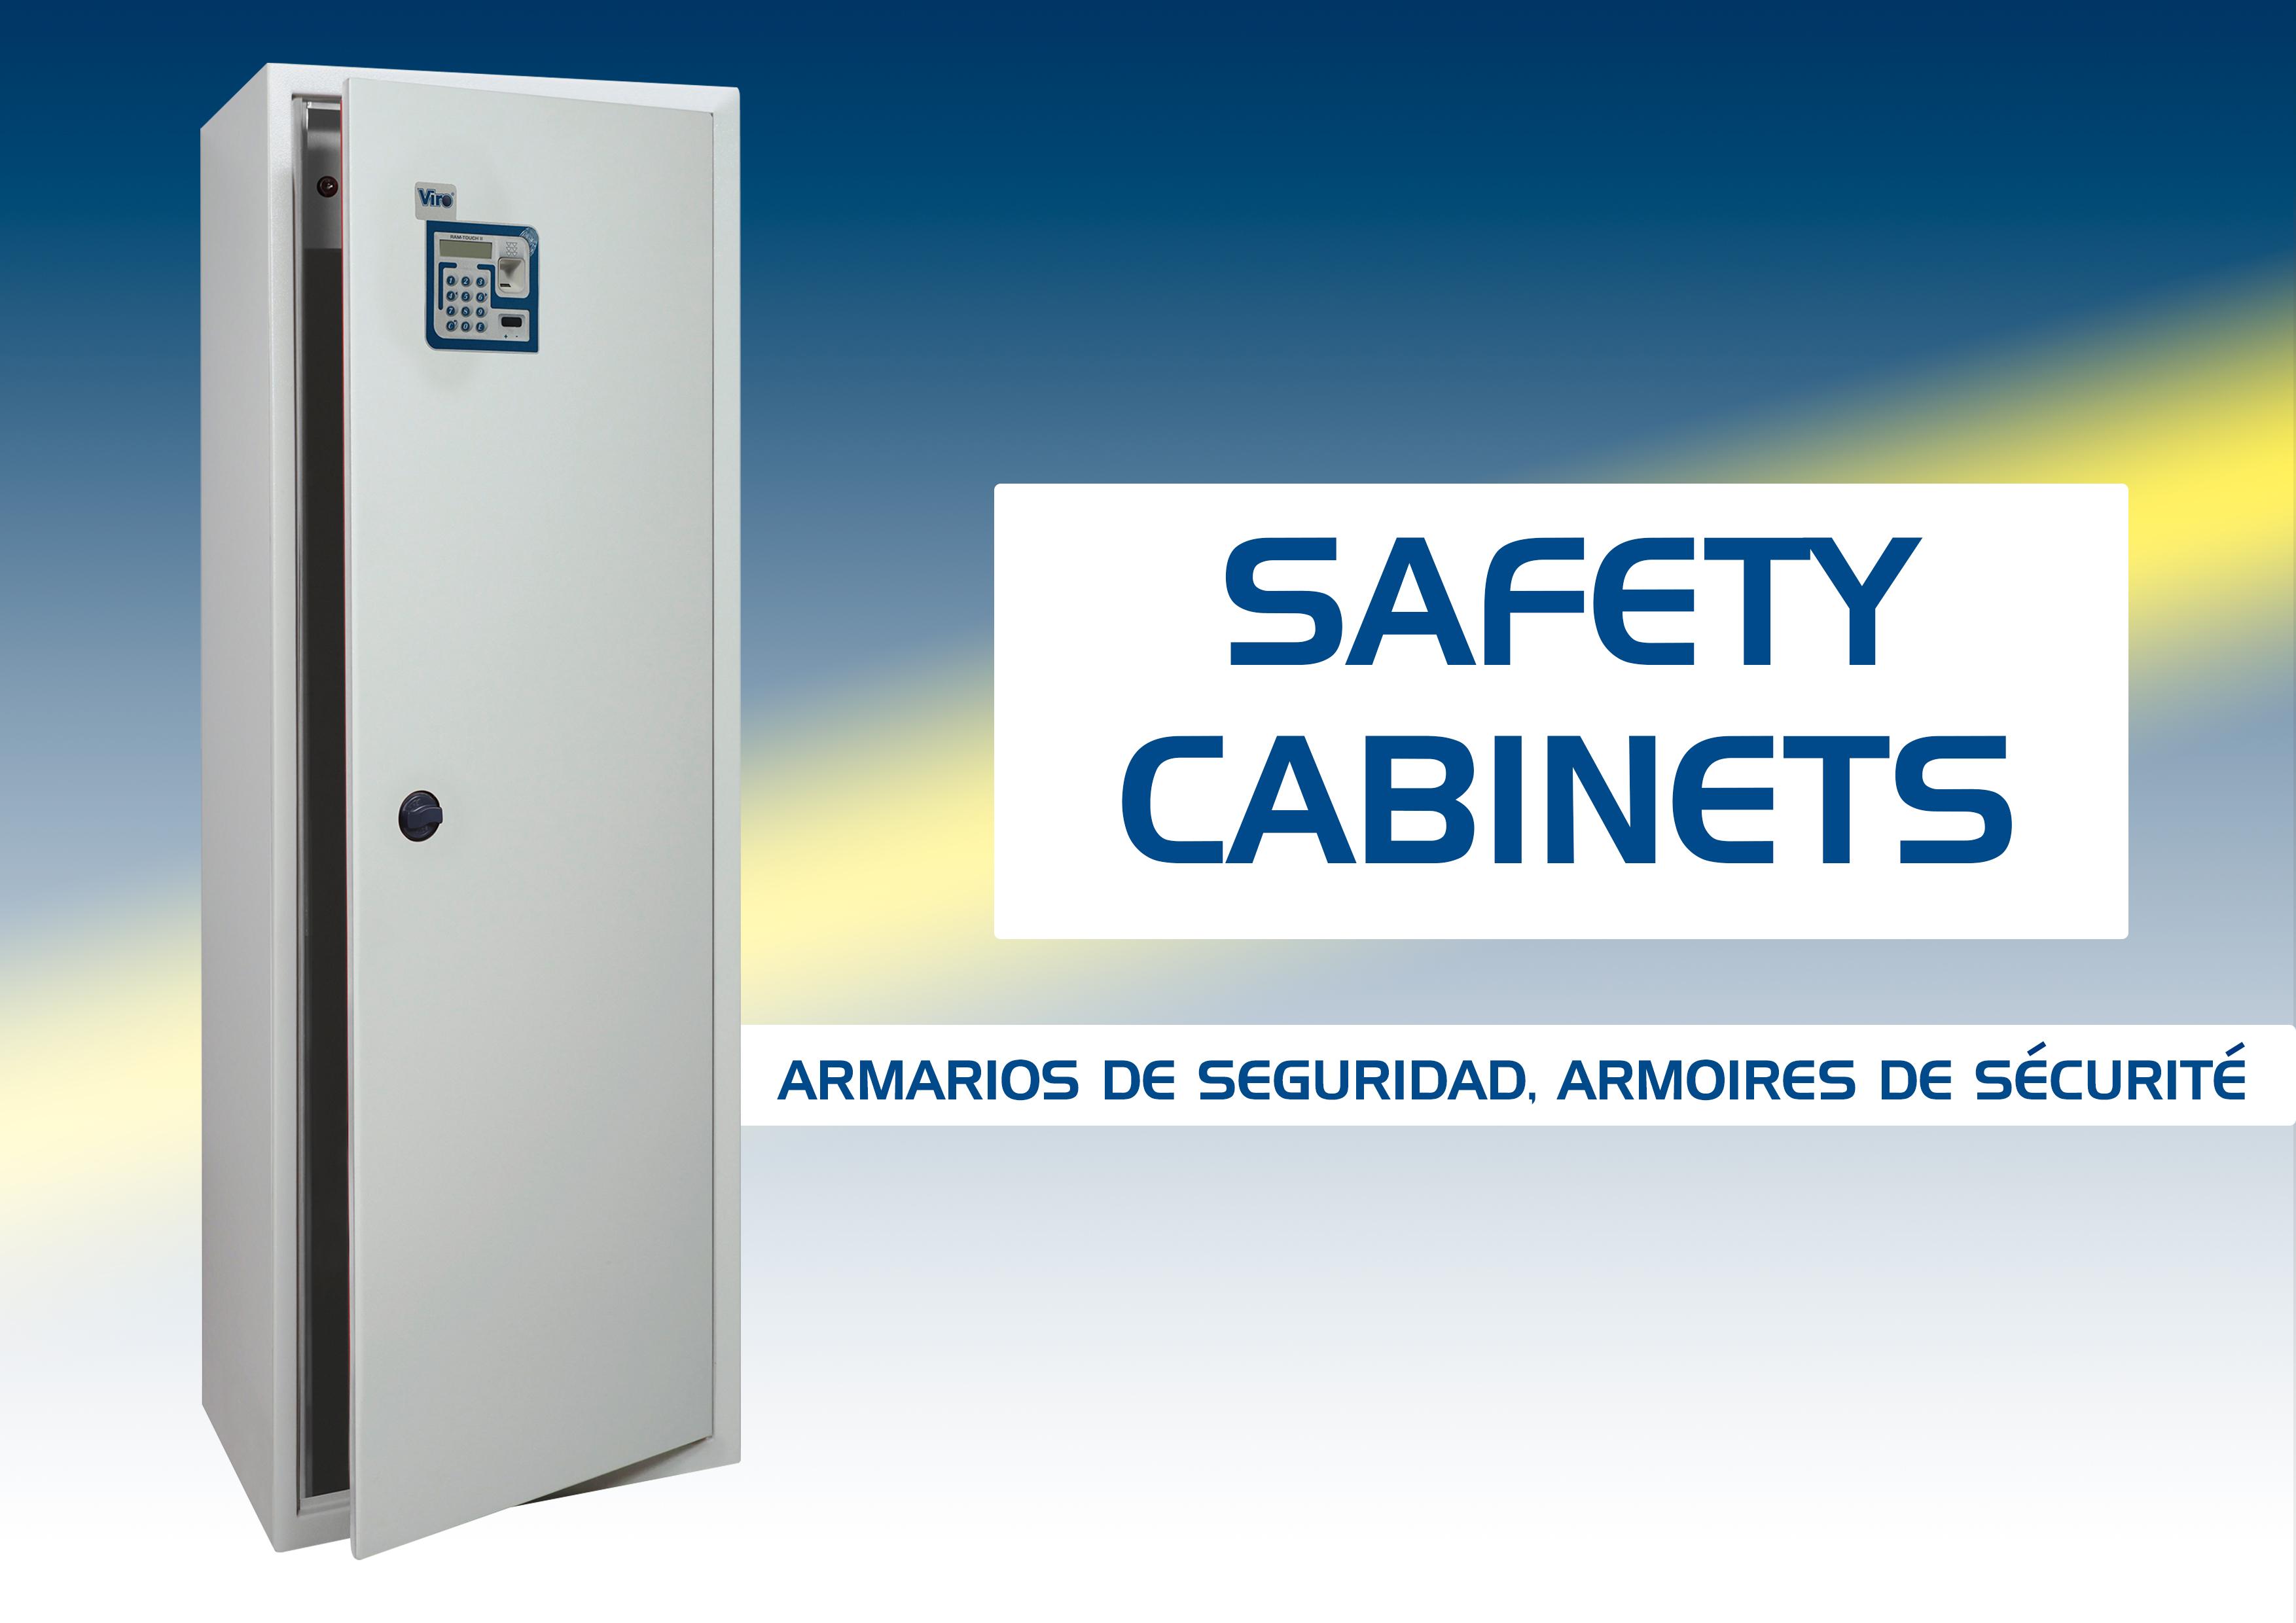 Armarios de seguridad, Armarios portafusiles, Armarios portadocumentos, armarios biométricos, armarios electrónicos